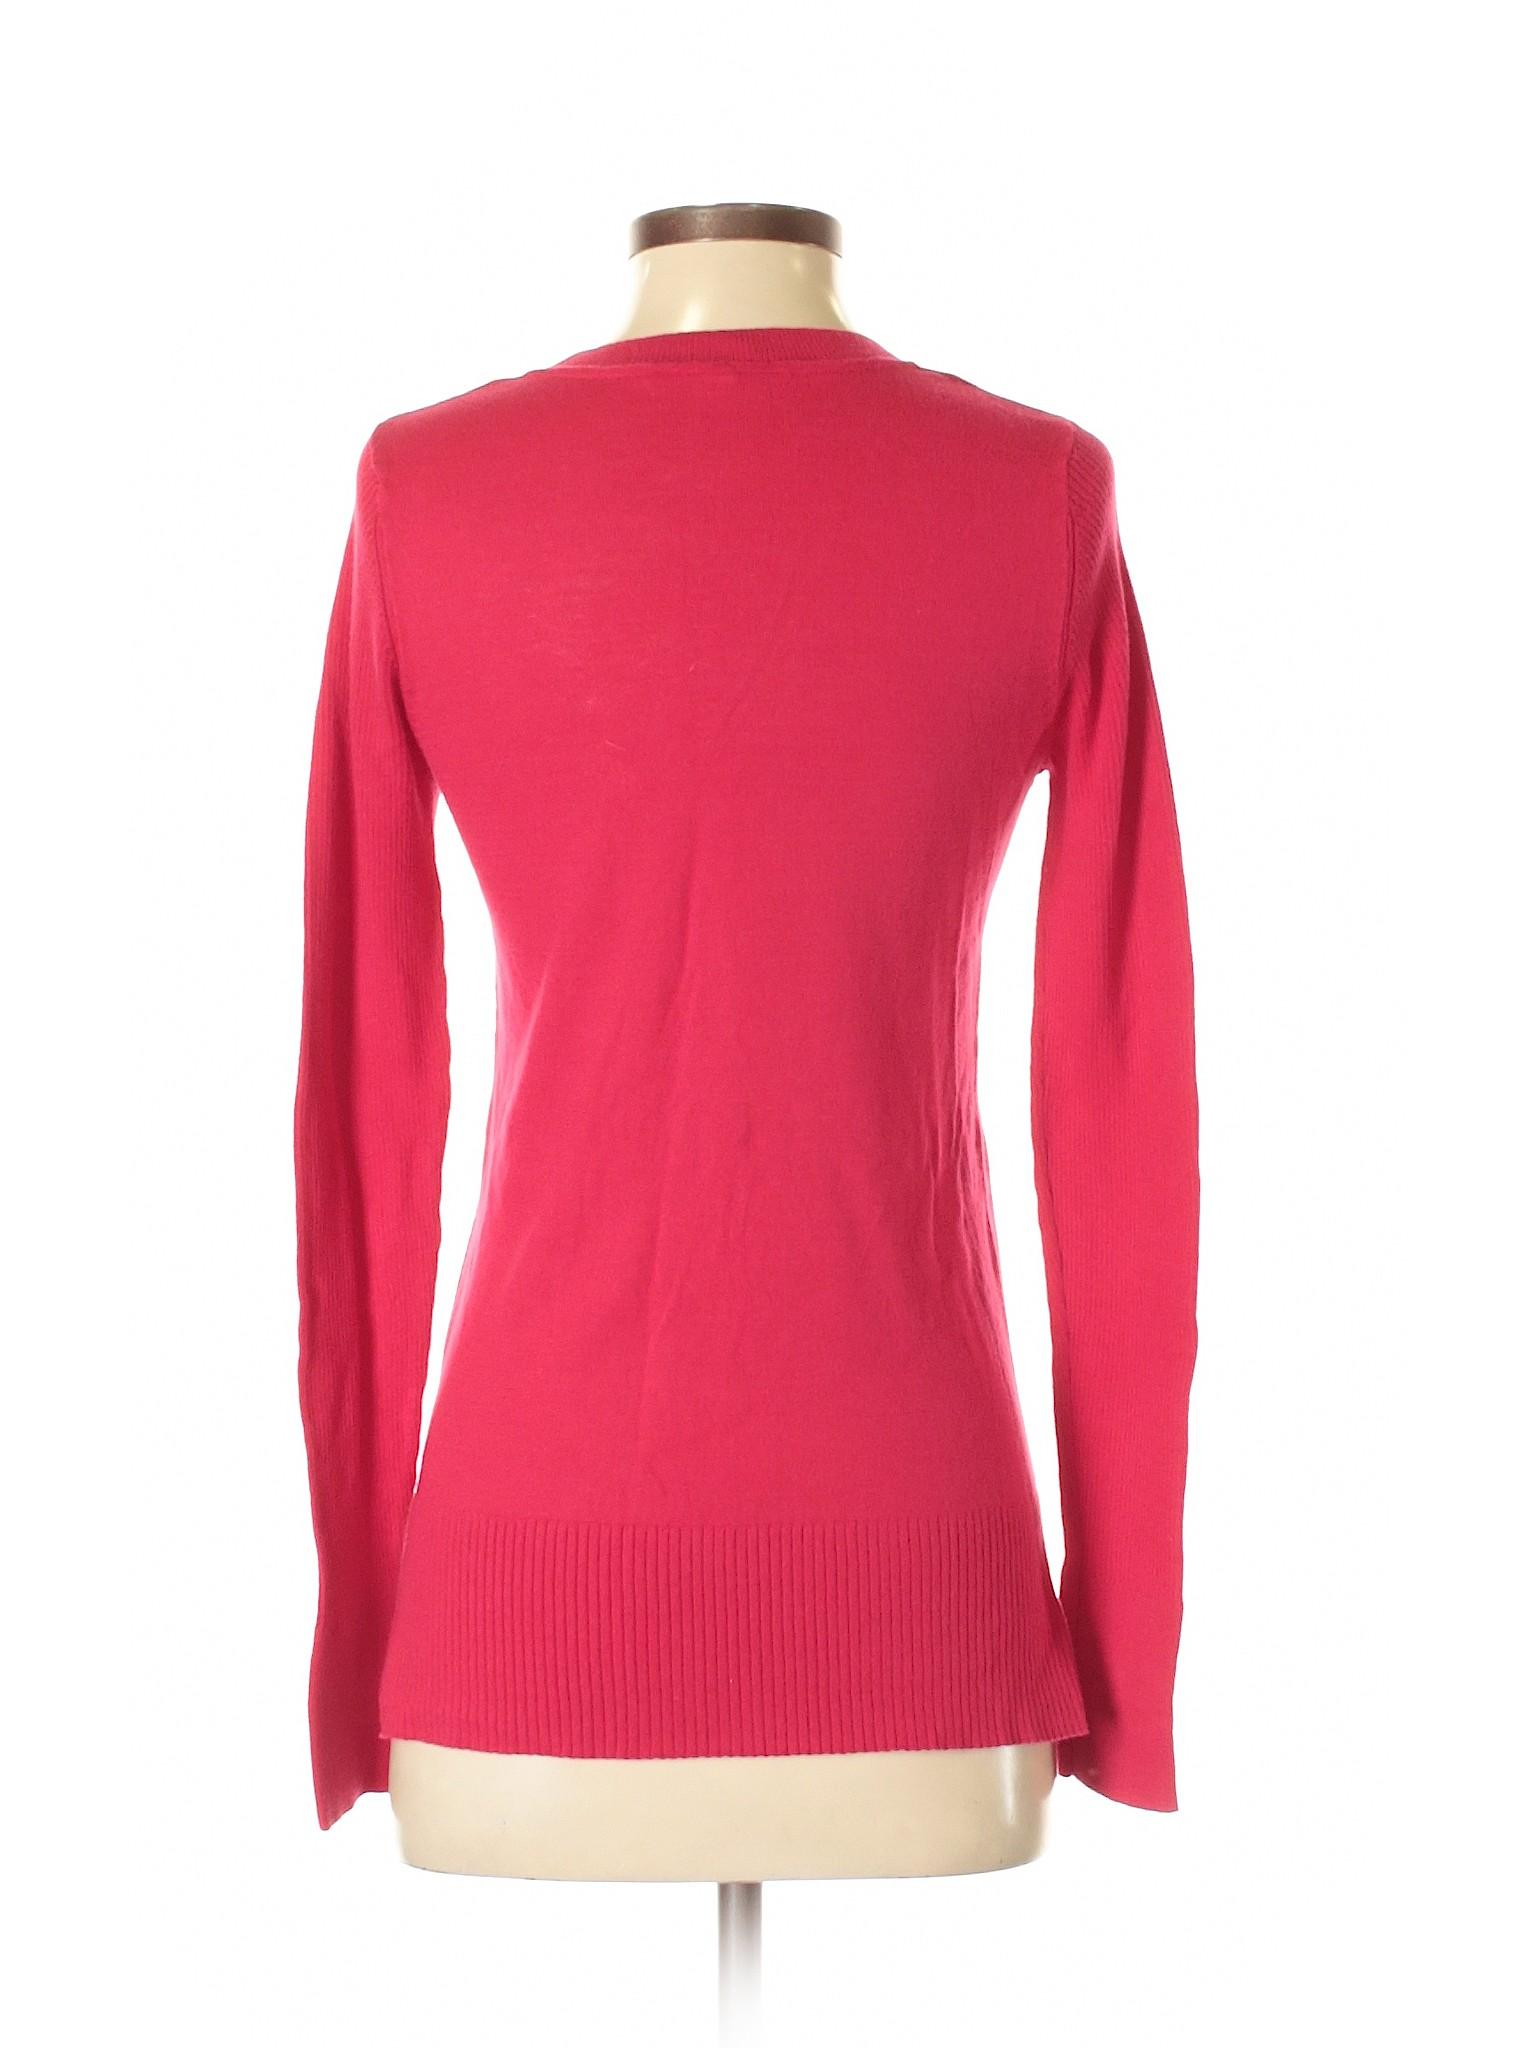 Boutique Victoria's Boutique Pullover Secret Victoria's Sweater dnSZqxwdUP